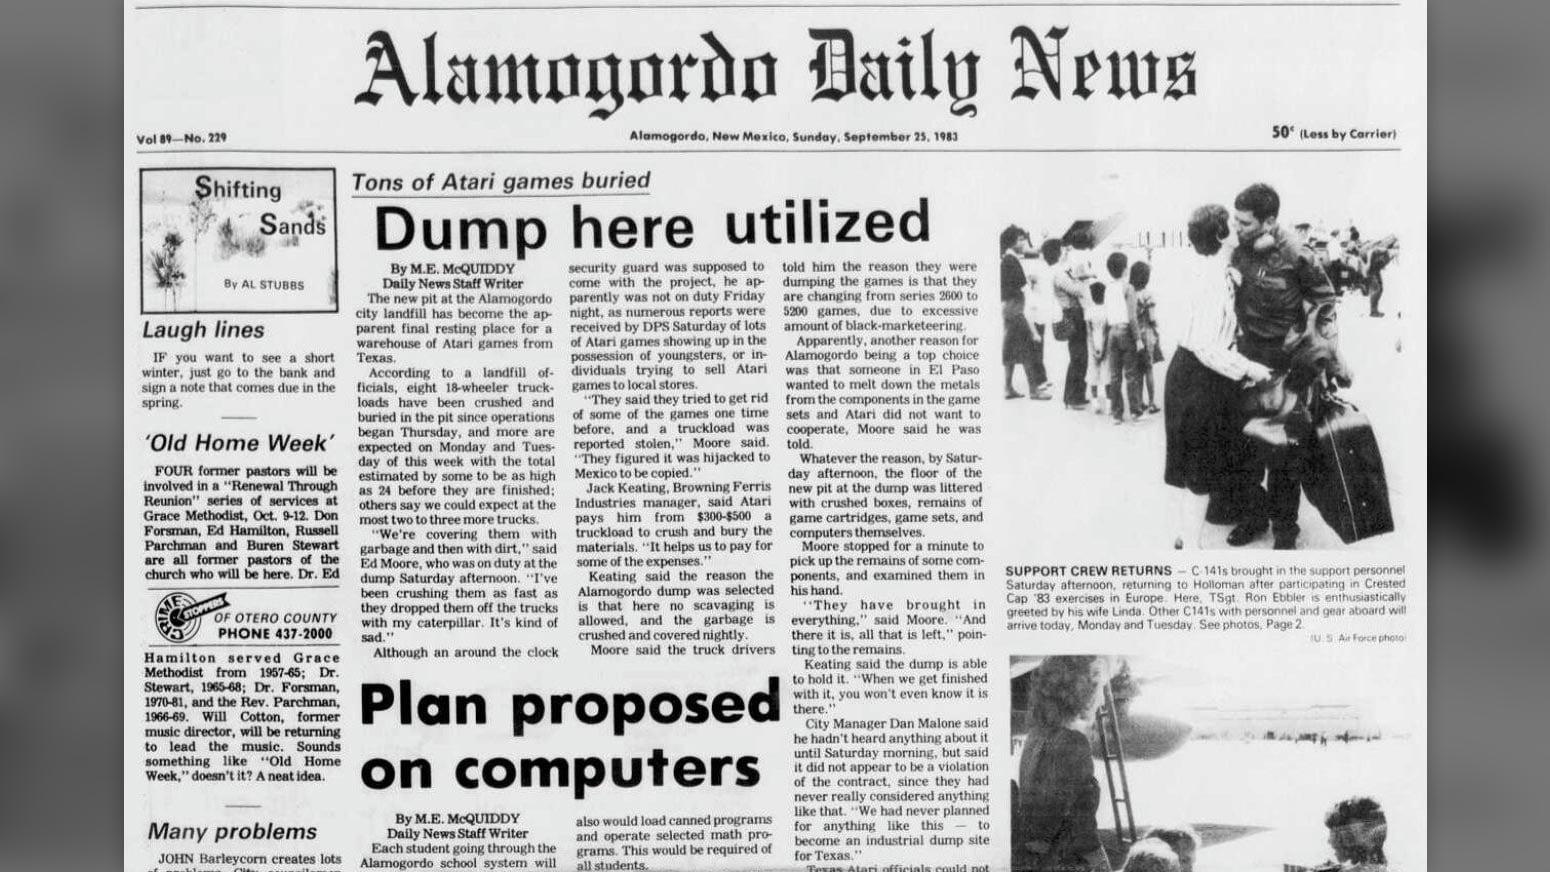 newspaperarchive